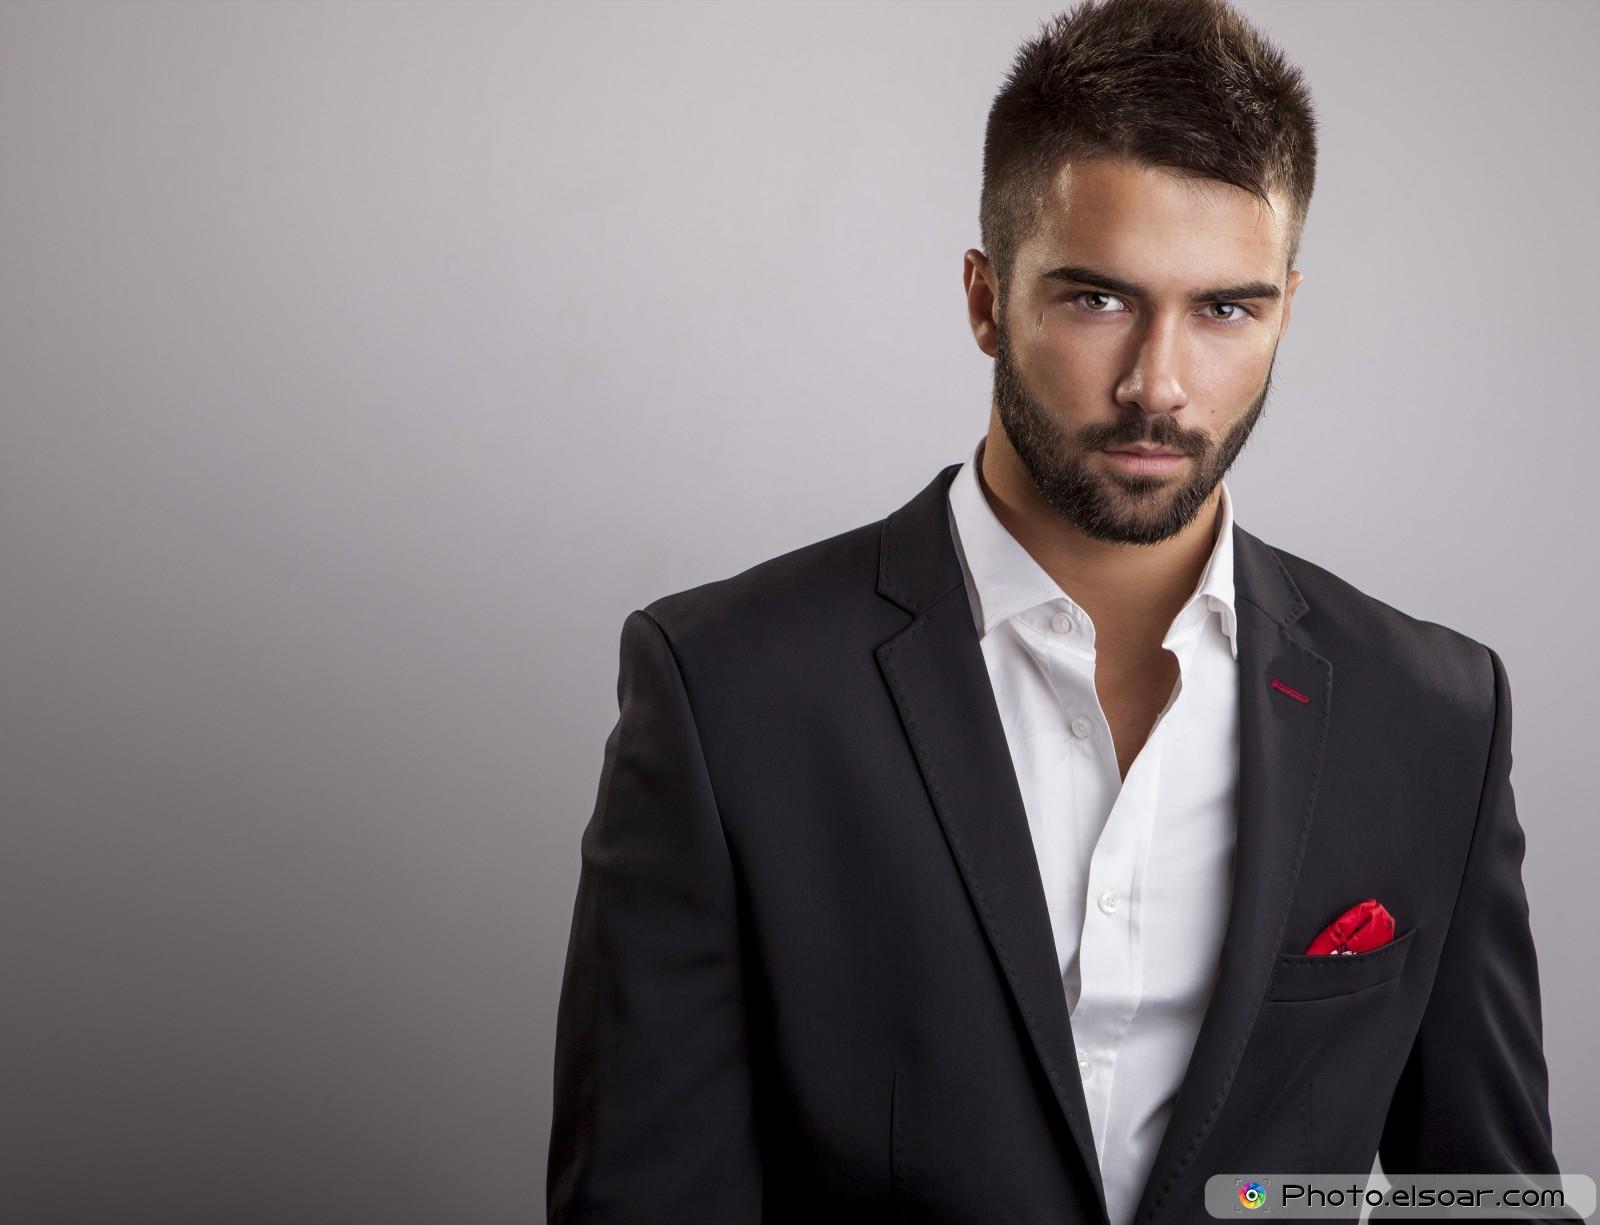 10 Most Handsome Men With Short Beards Hq Photos Elsoar